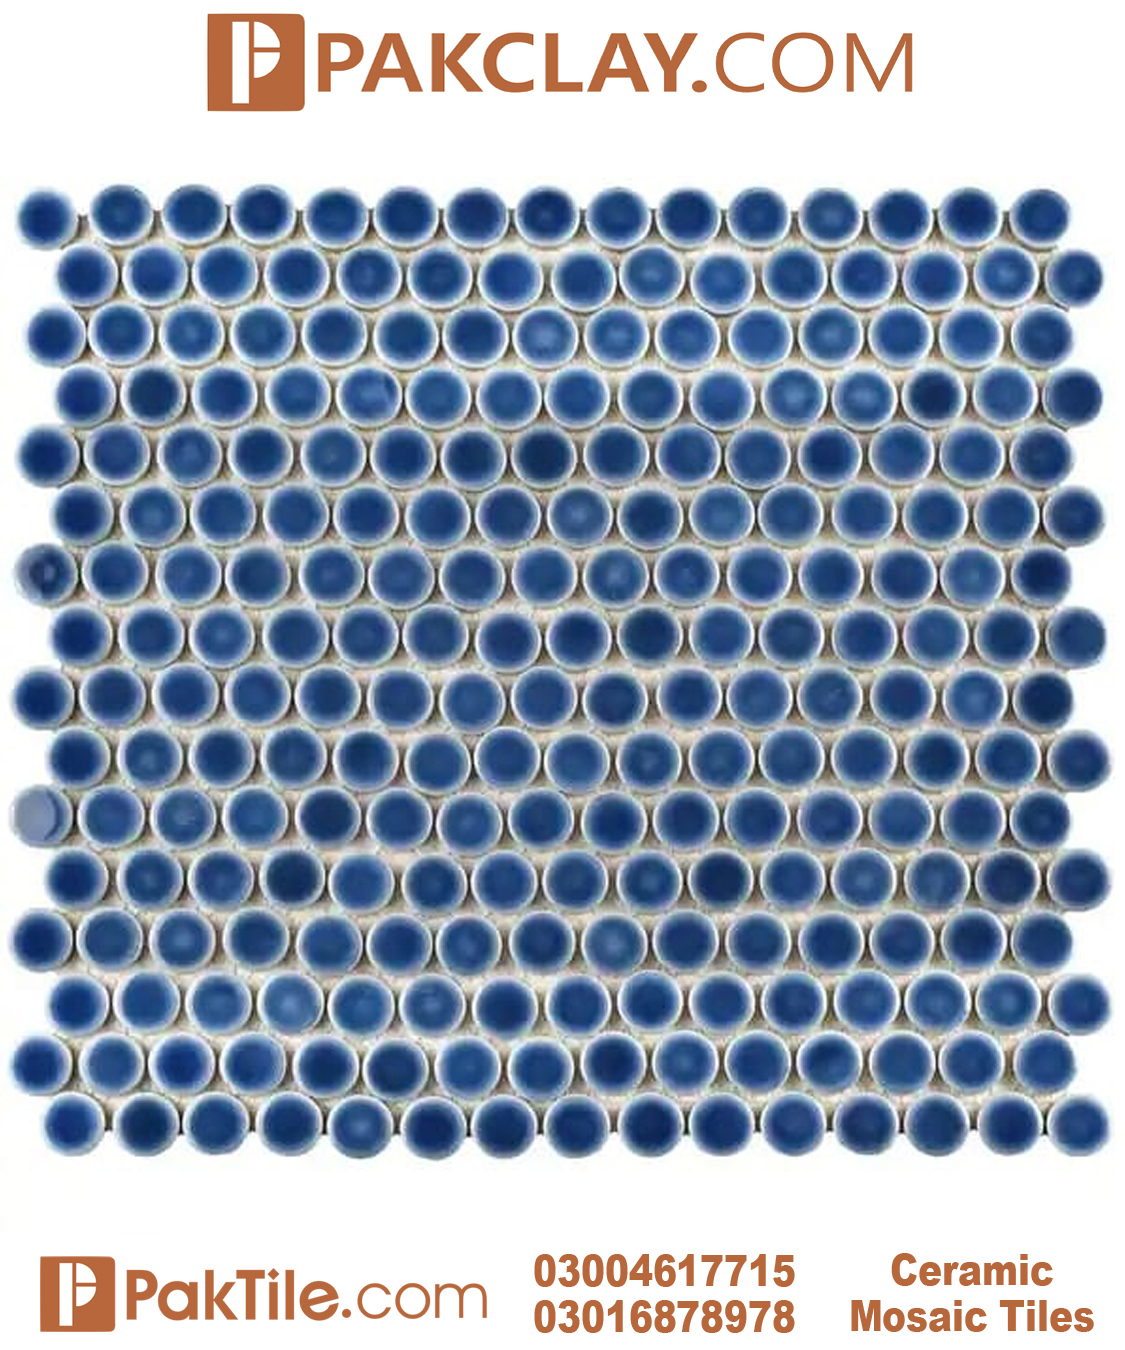 Navy Blue Color Ceramic Bathroom Wall Tiles in Pakistan